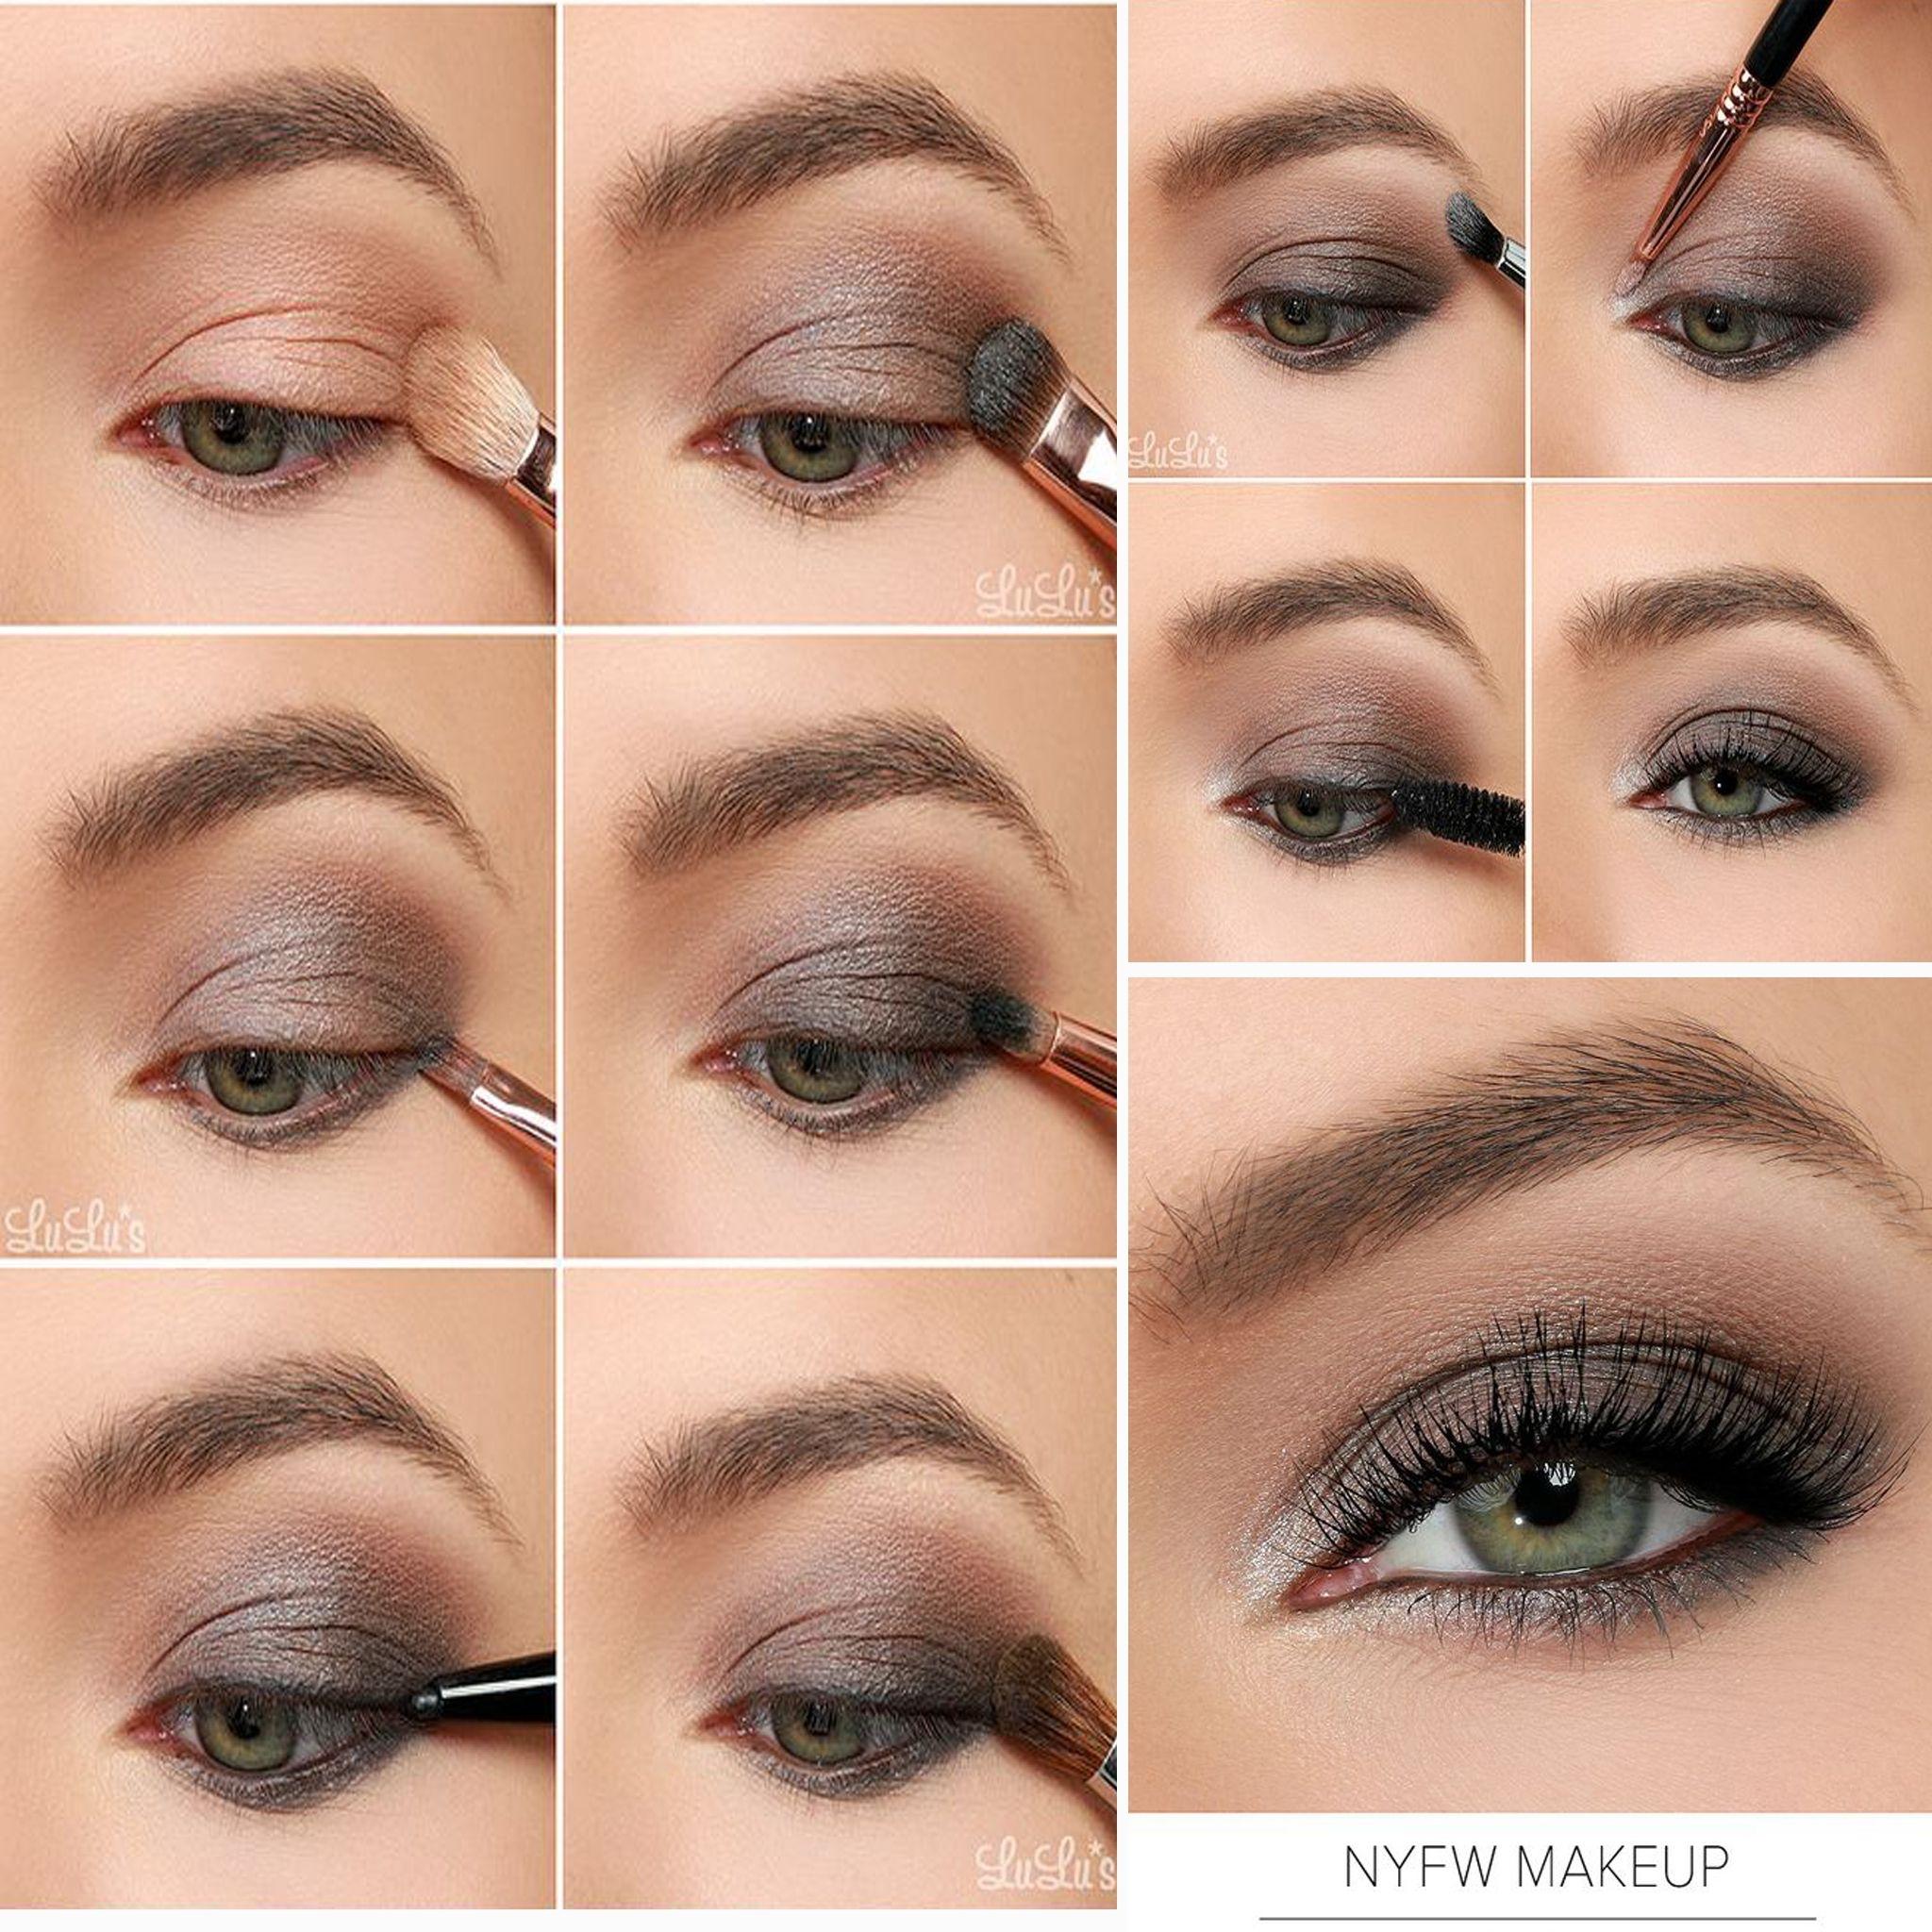 5 Step By Step Smokey Eye Makeup Tutorials For Beginners | Make Up throughout Smokey Eye Makeup Tutorial For Beginners